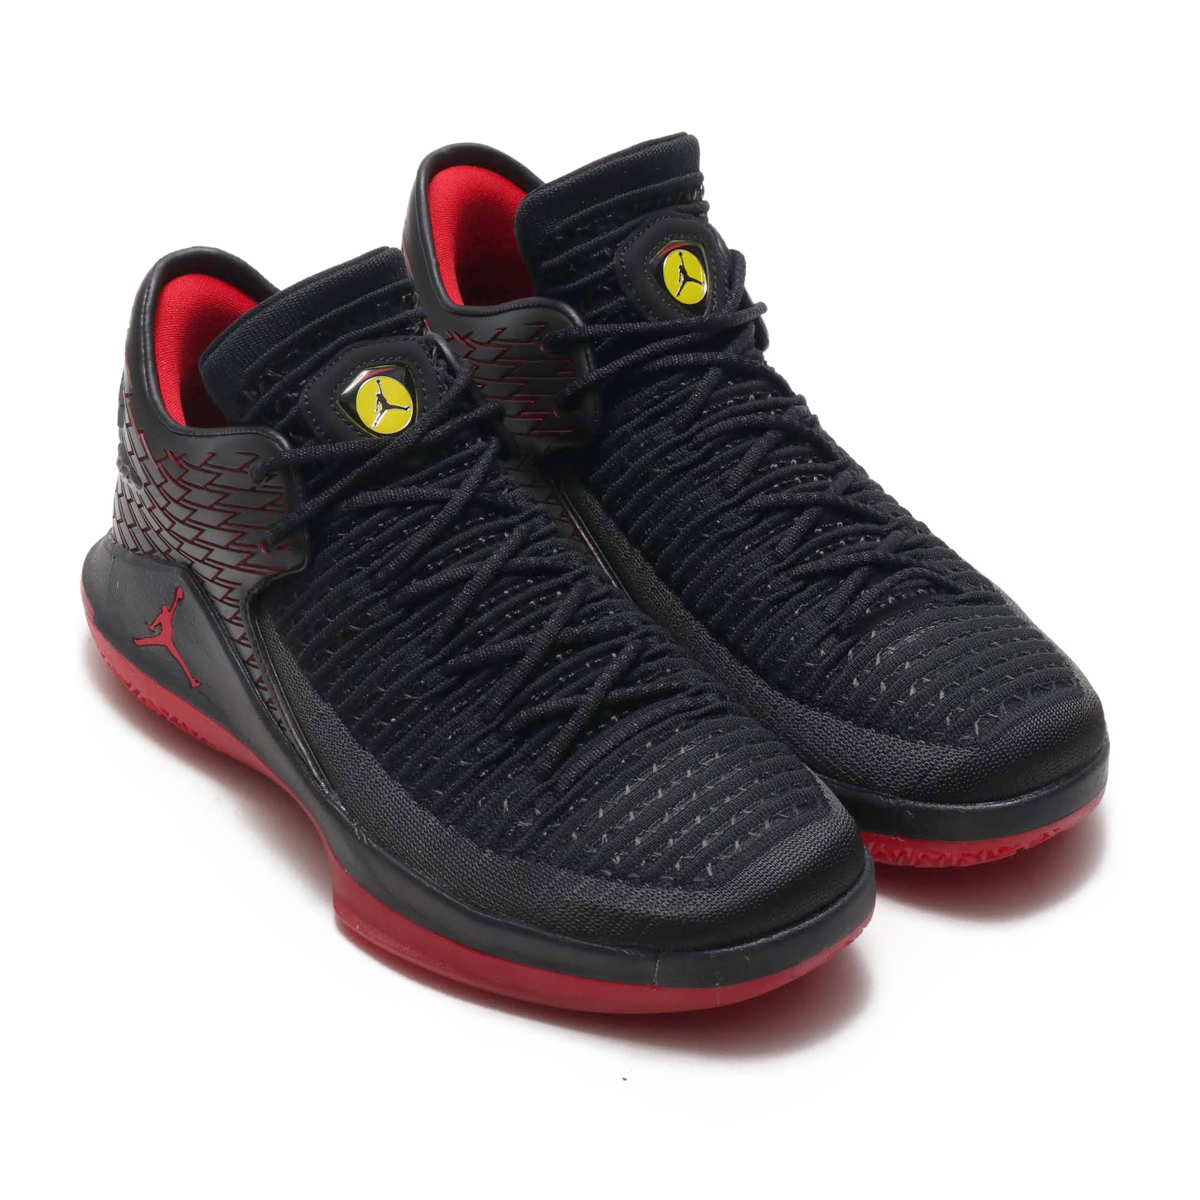 afd7940ebc3 atmos pink: NIKE AIR JORDAN XXXII LOW PF (Nike Air Jordan XXXII low ...